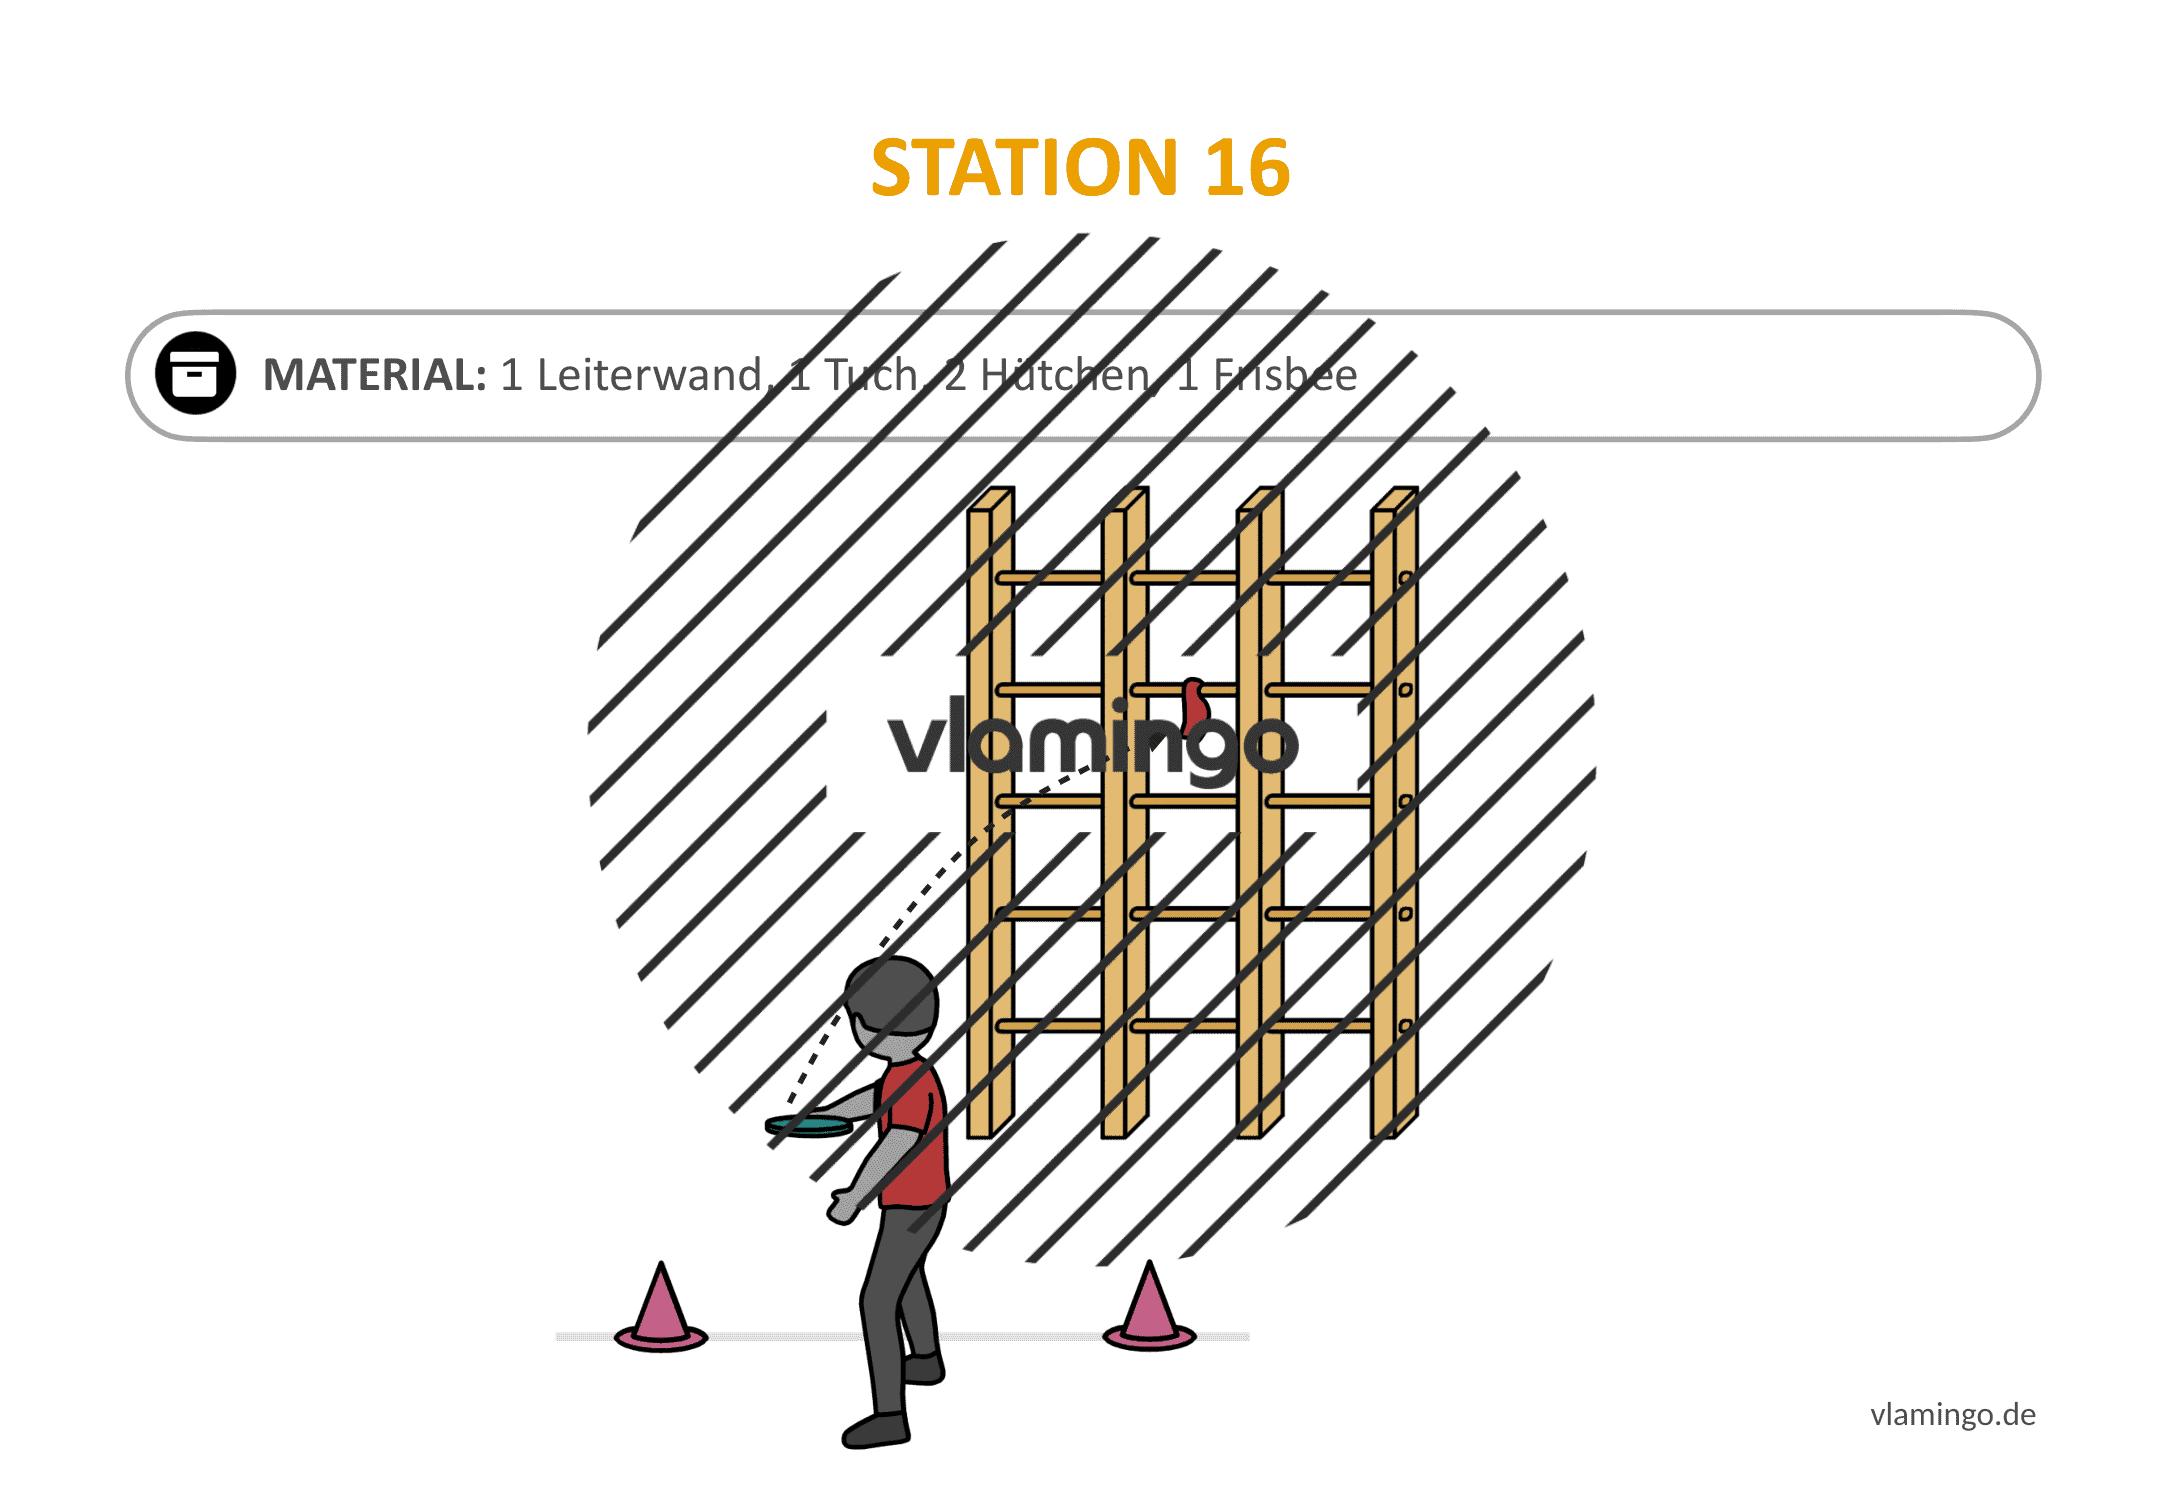 Frisbeegolf (Disc-Golf) - Station 16